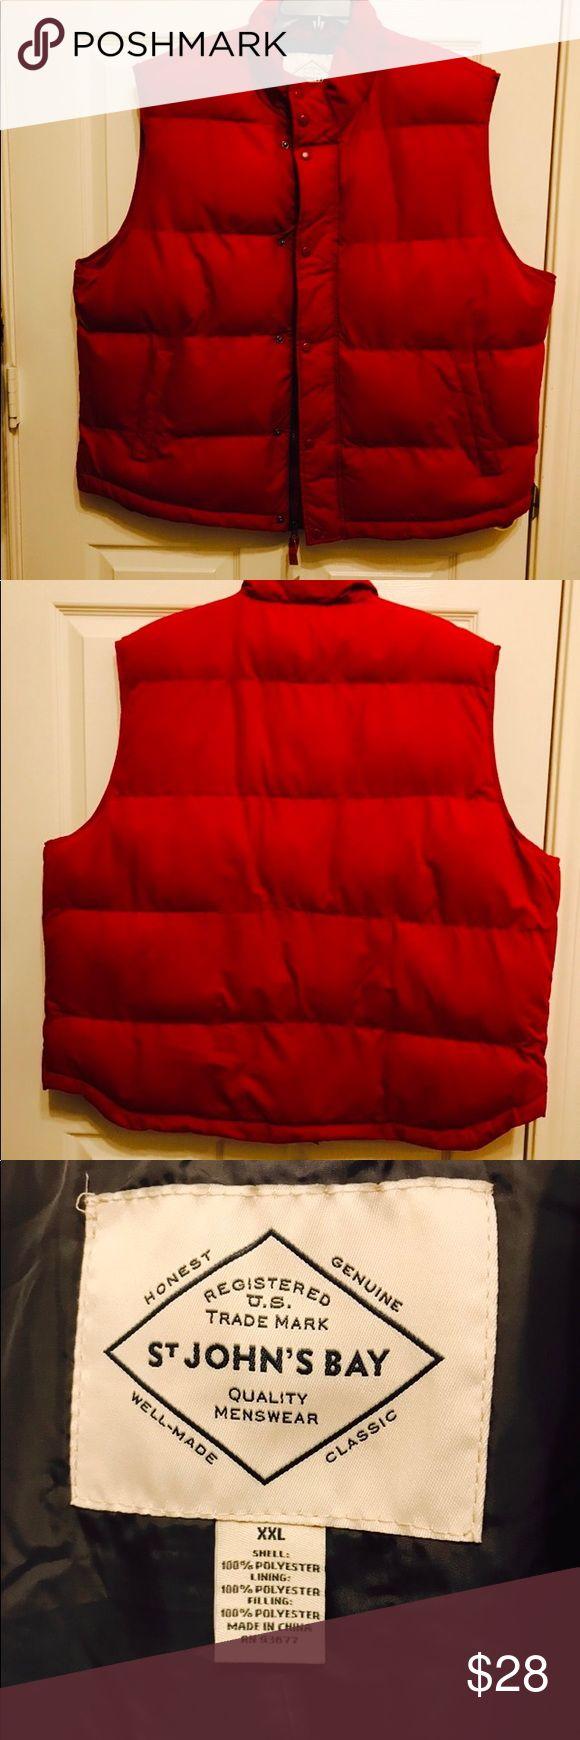 NWT - Men's Puffer Vest - St. John's Bay NWT - Men's Puffer Vest - St. John's Bay St. John's Bay Jackets & Coats Vests